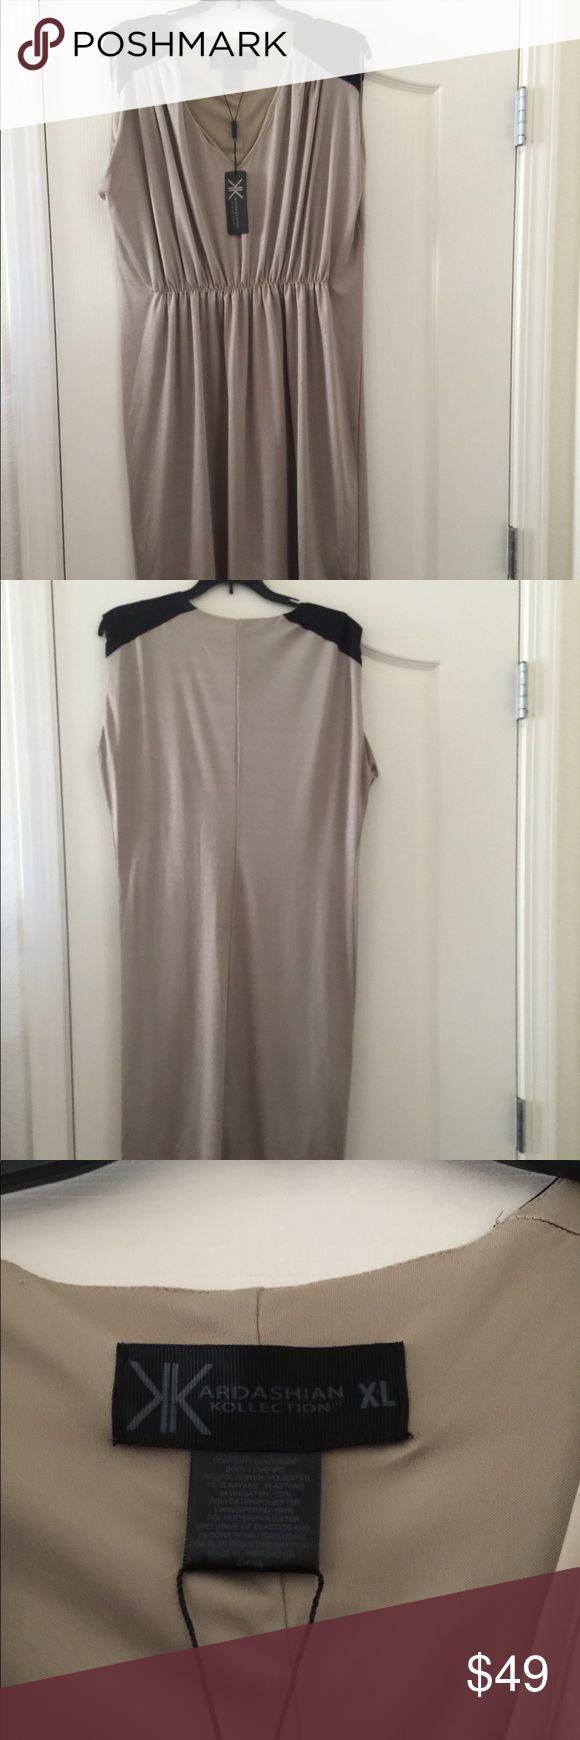 KARDASHIAN KOLLECTION GOLD/BLACK DRESS Gold and black Kardashian Kollection Dresses